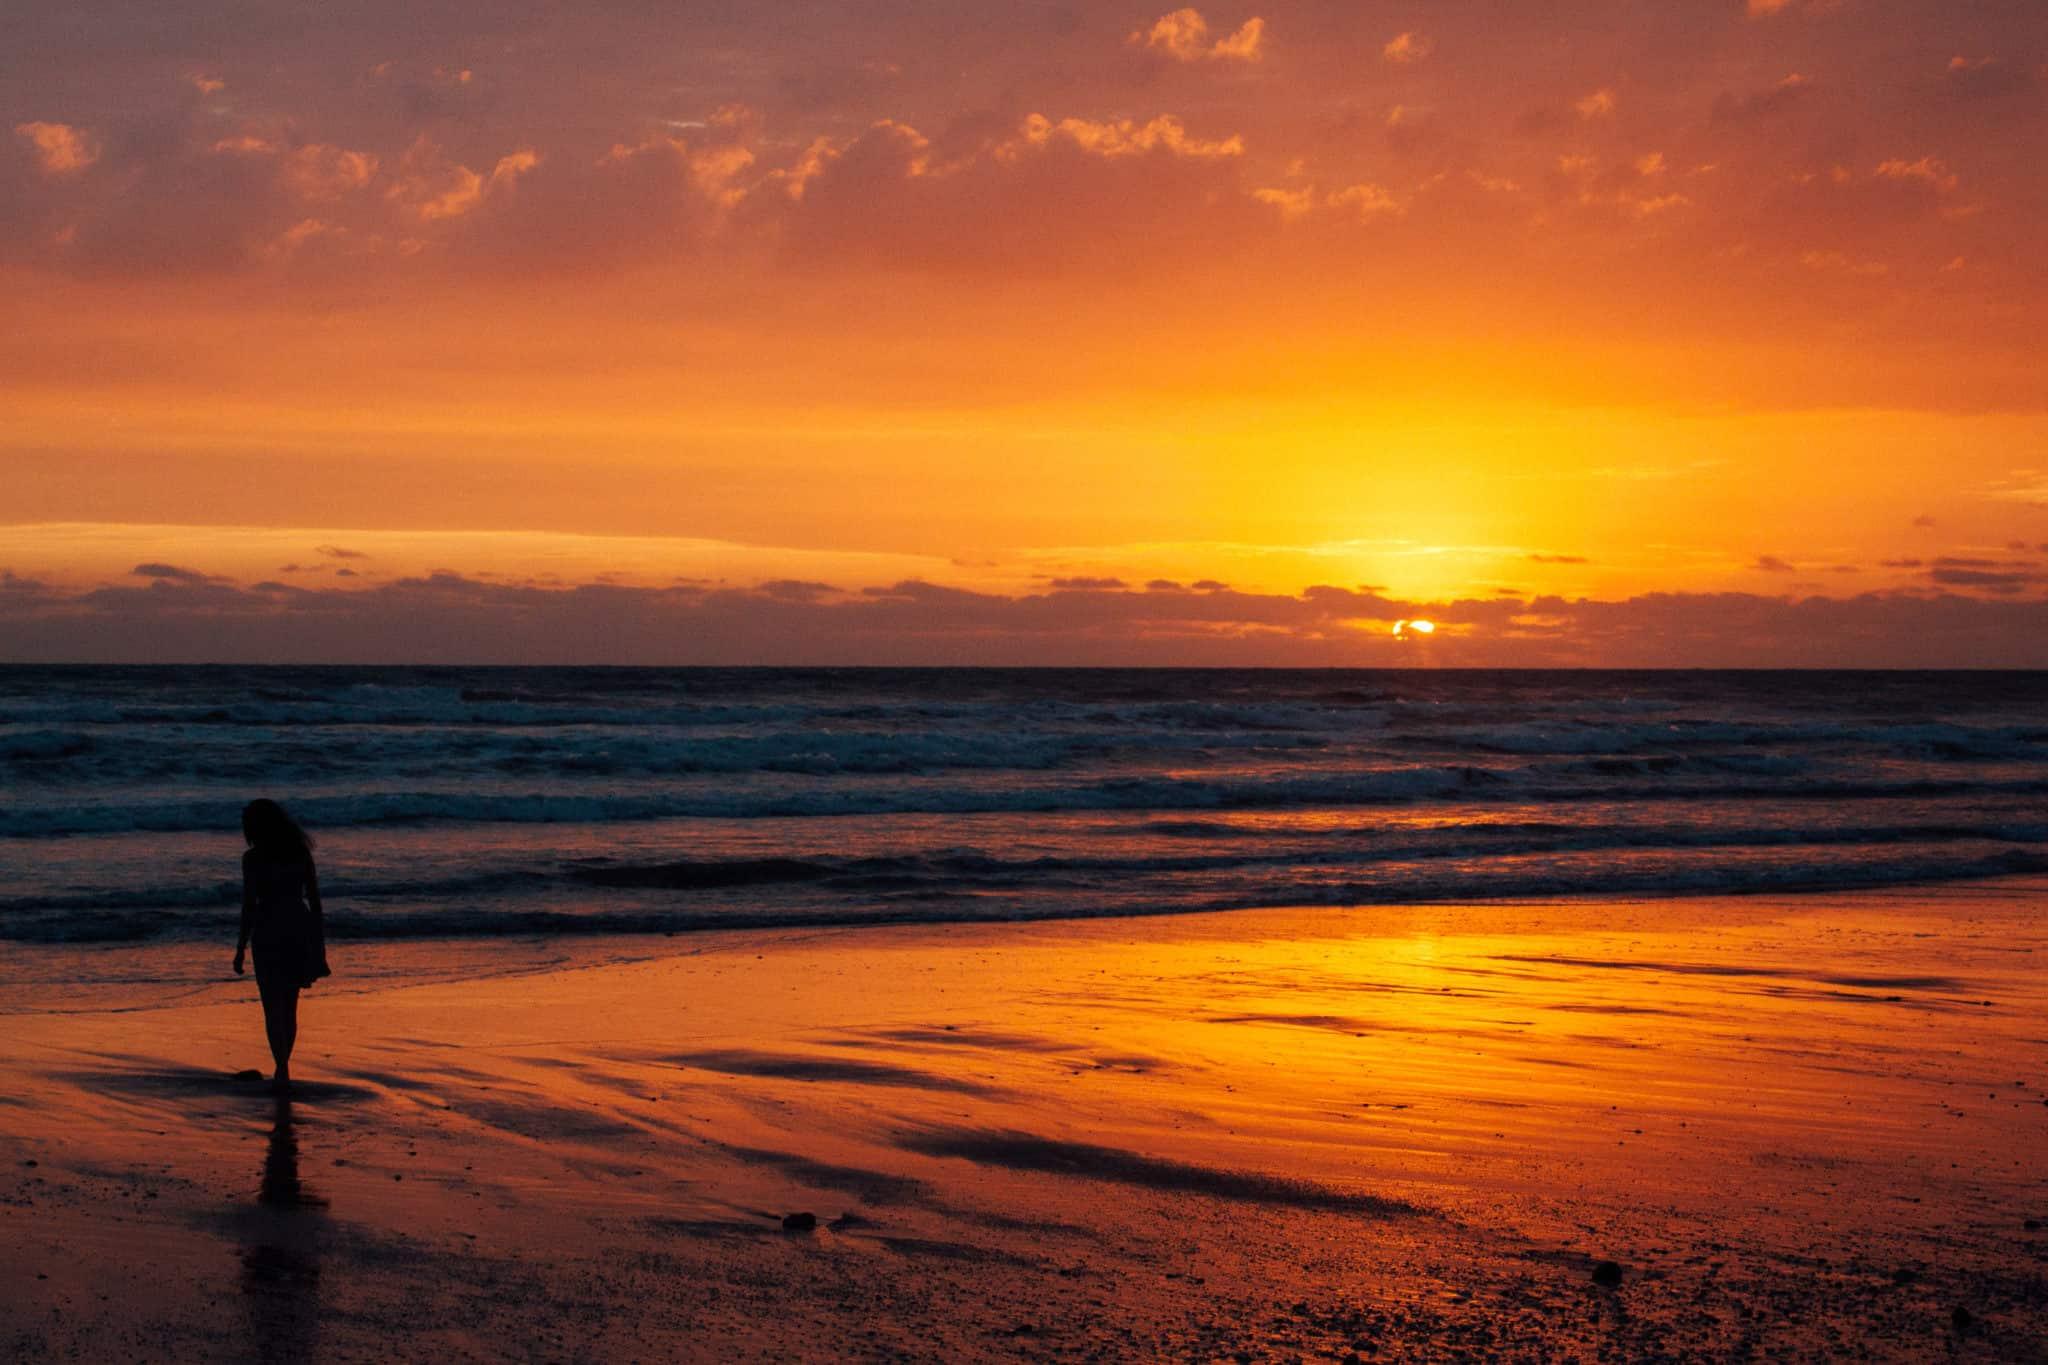 Simplicity of a Sunset